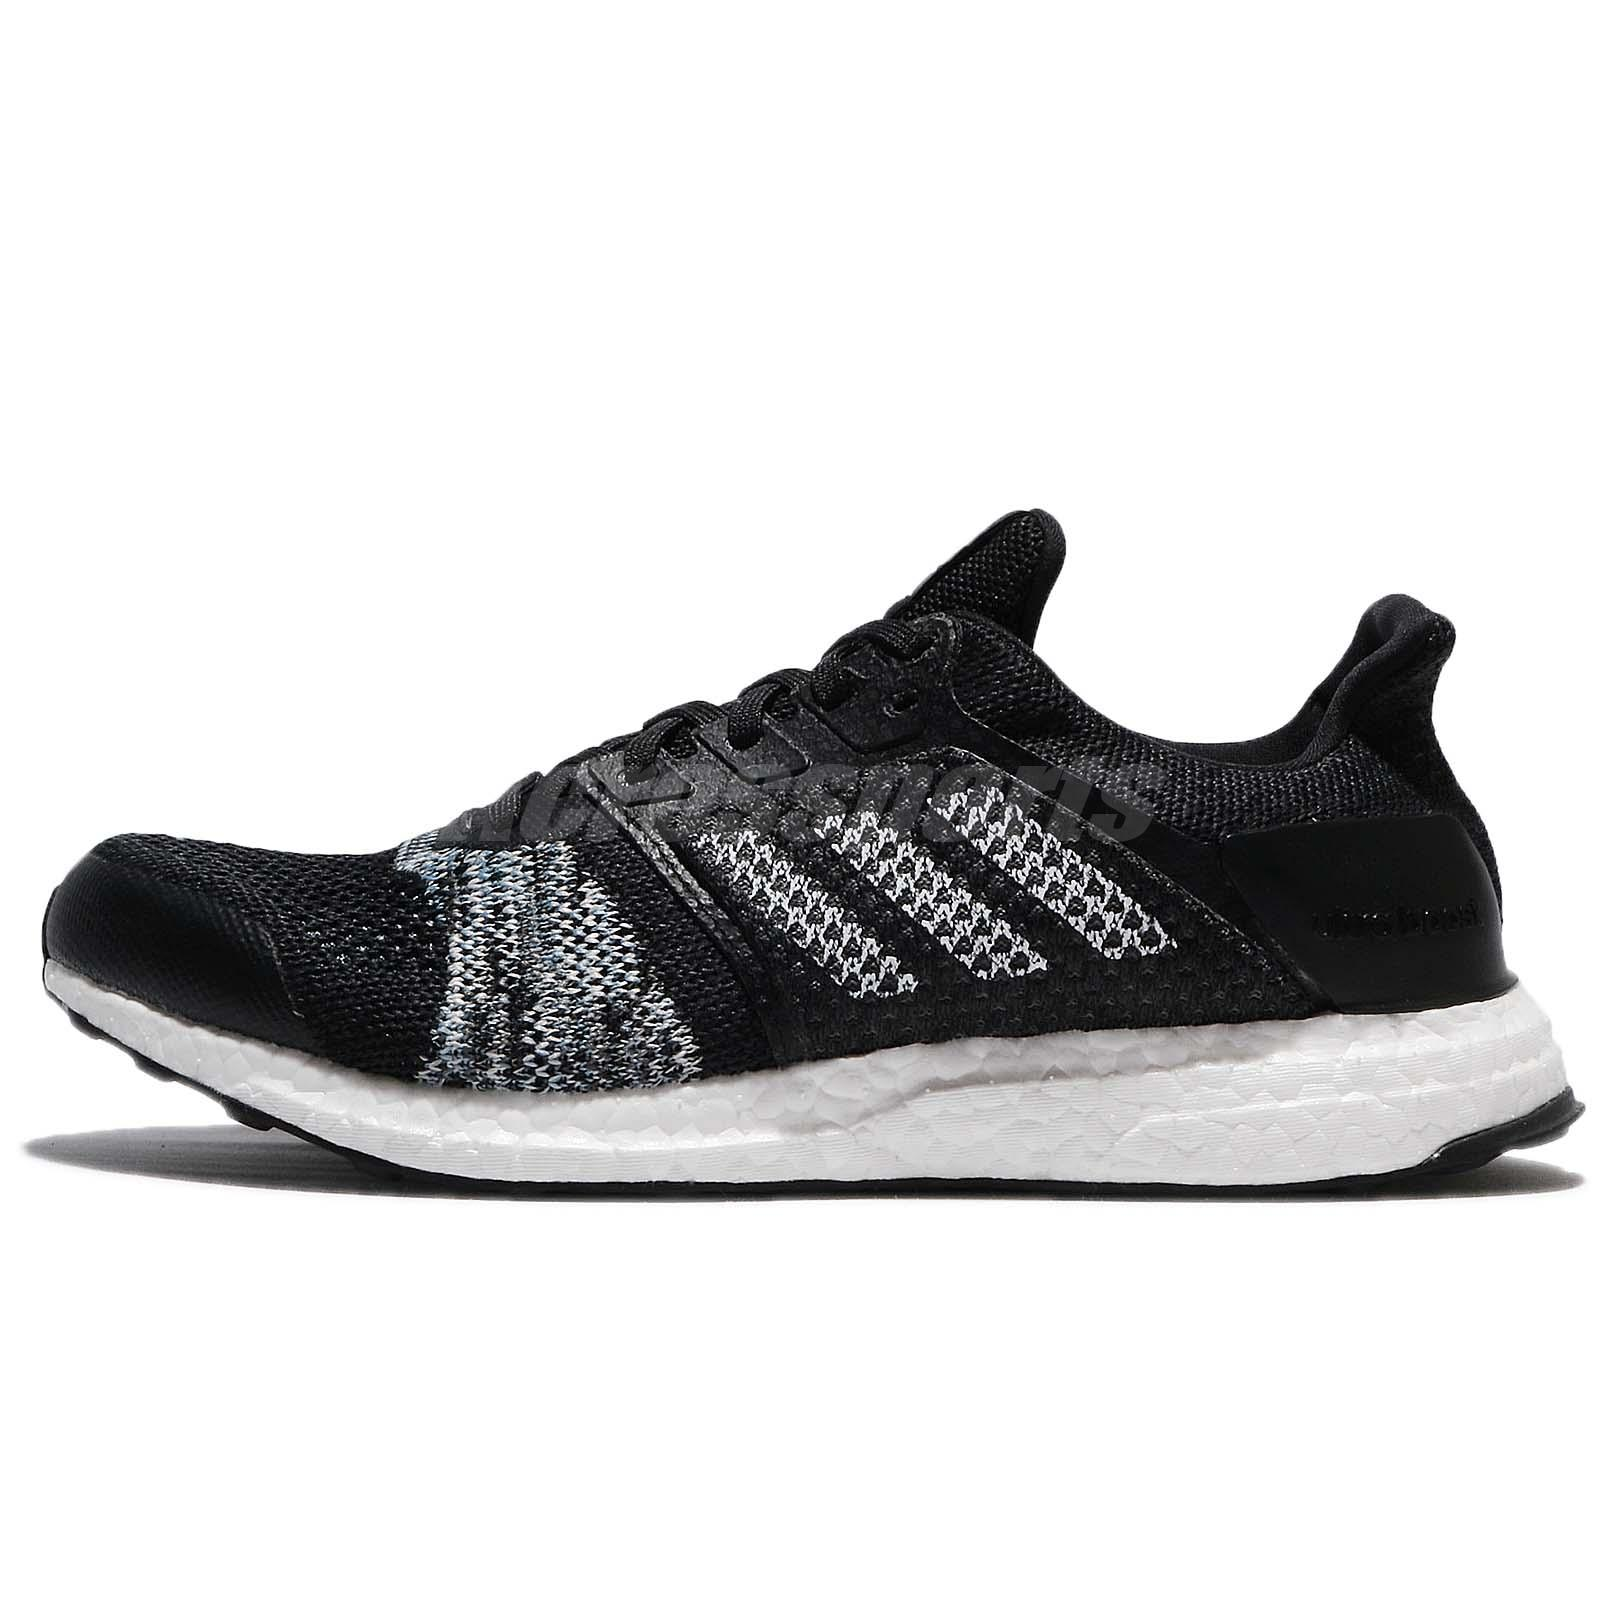 982d8d5ac adidas UltraB OOST ST M PrimeKnit Black White Men Running Shoes Sneakers  CQ2144